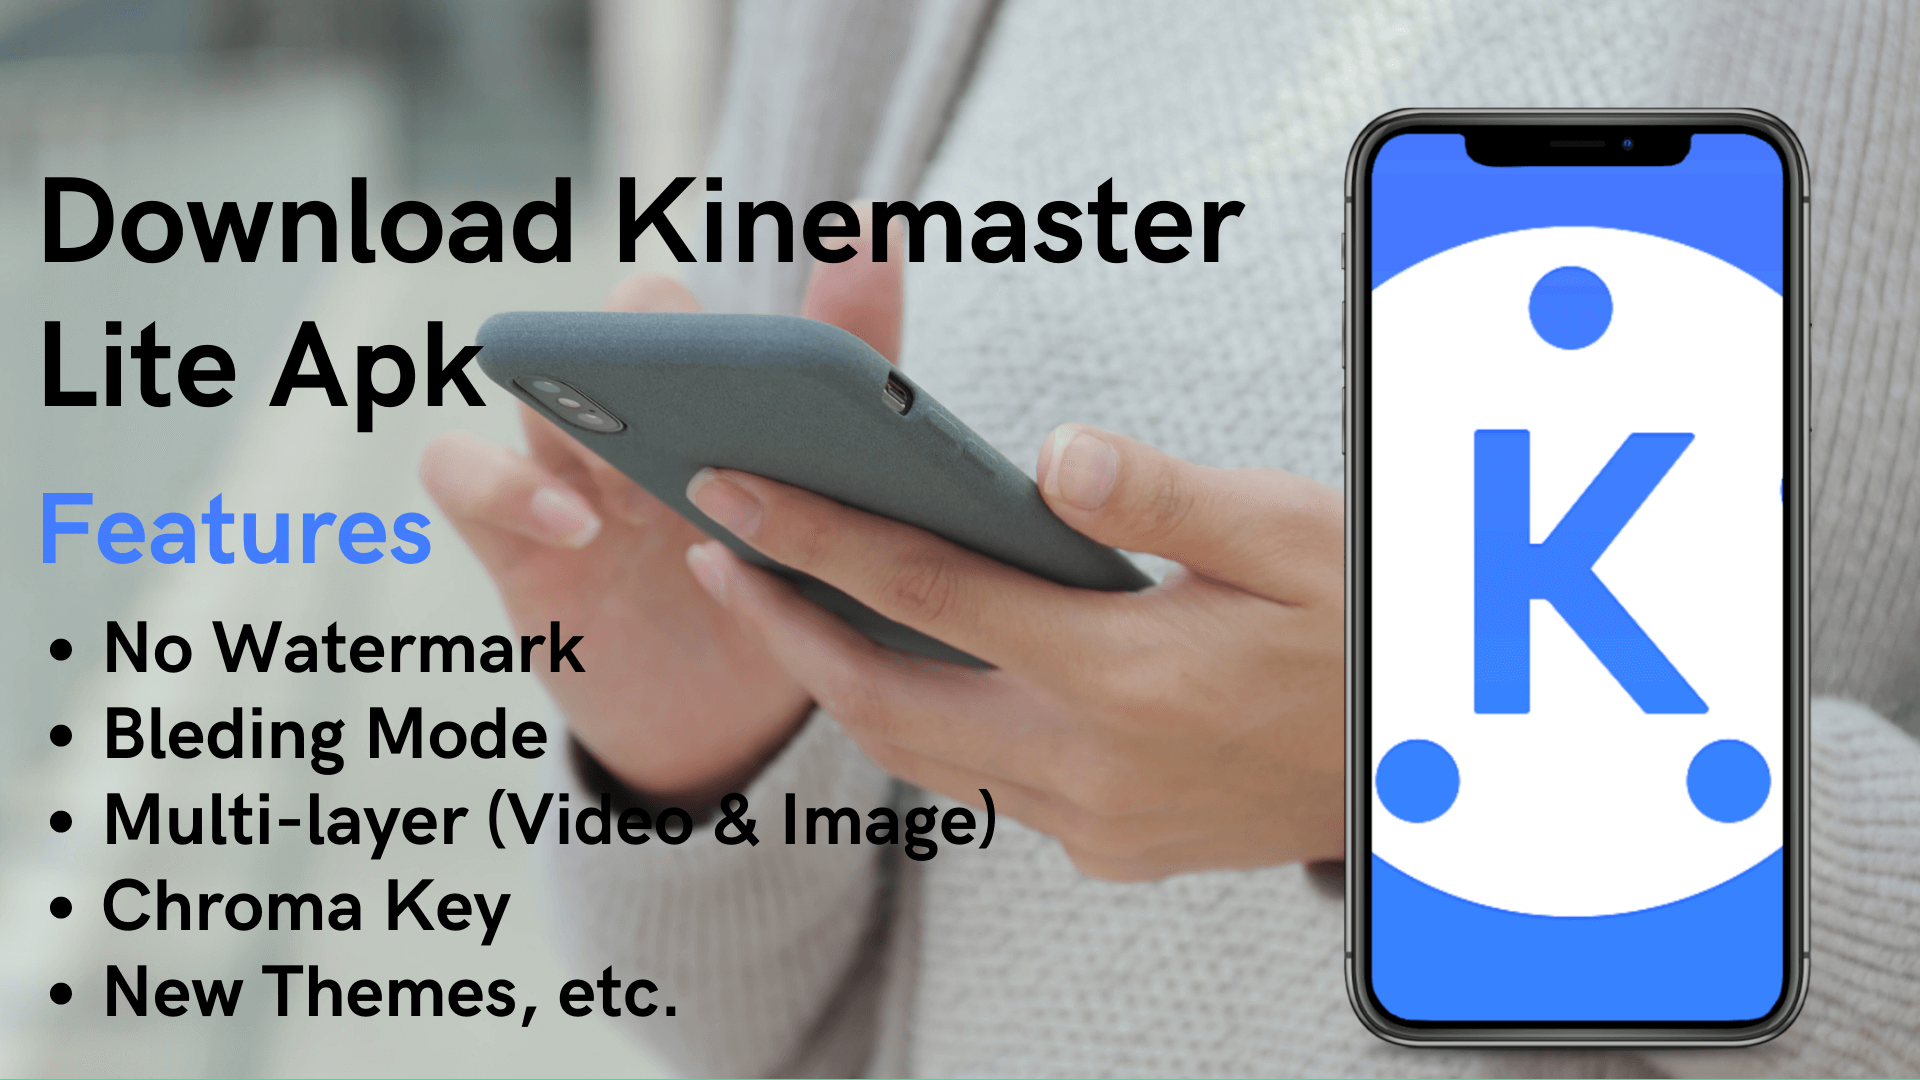 Download Kinemaster Lite Apk